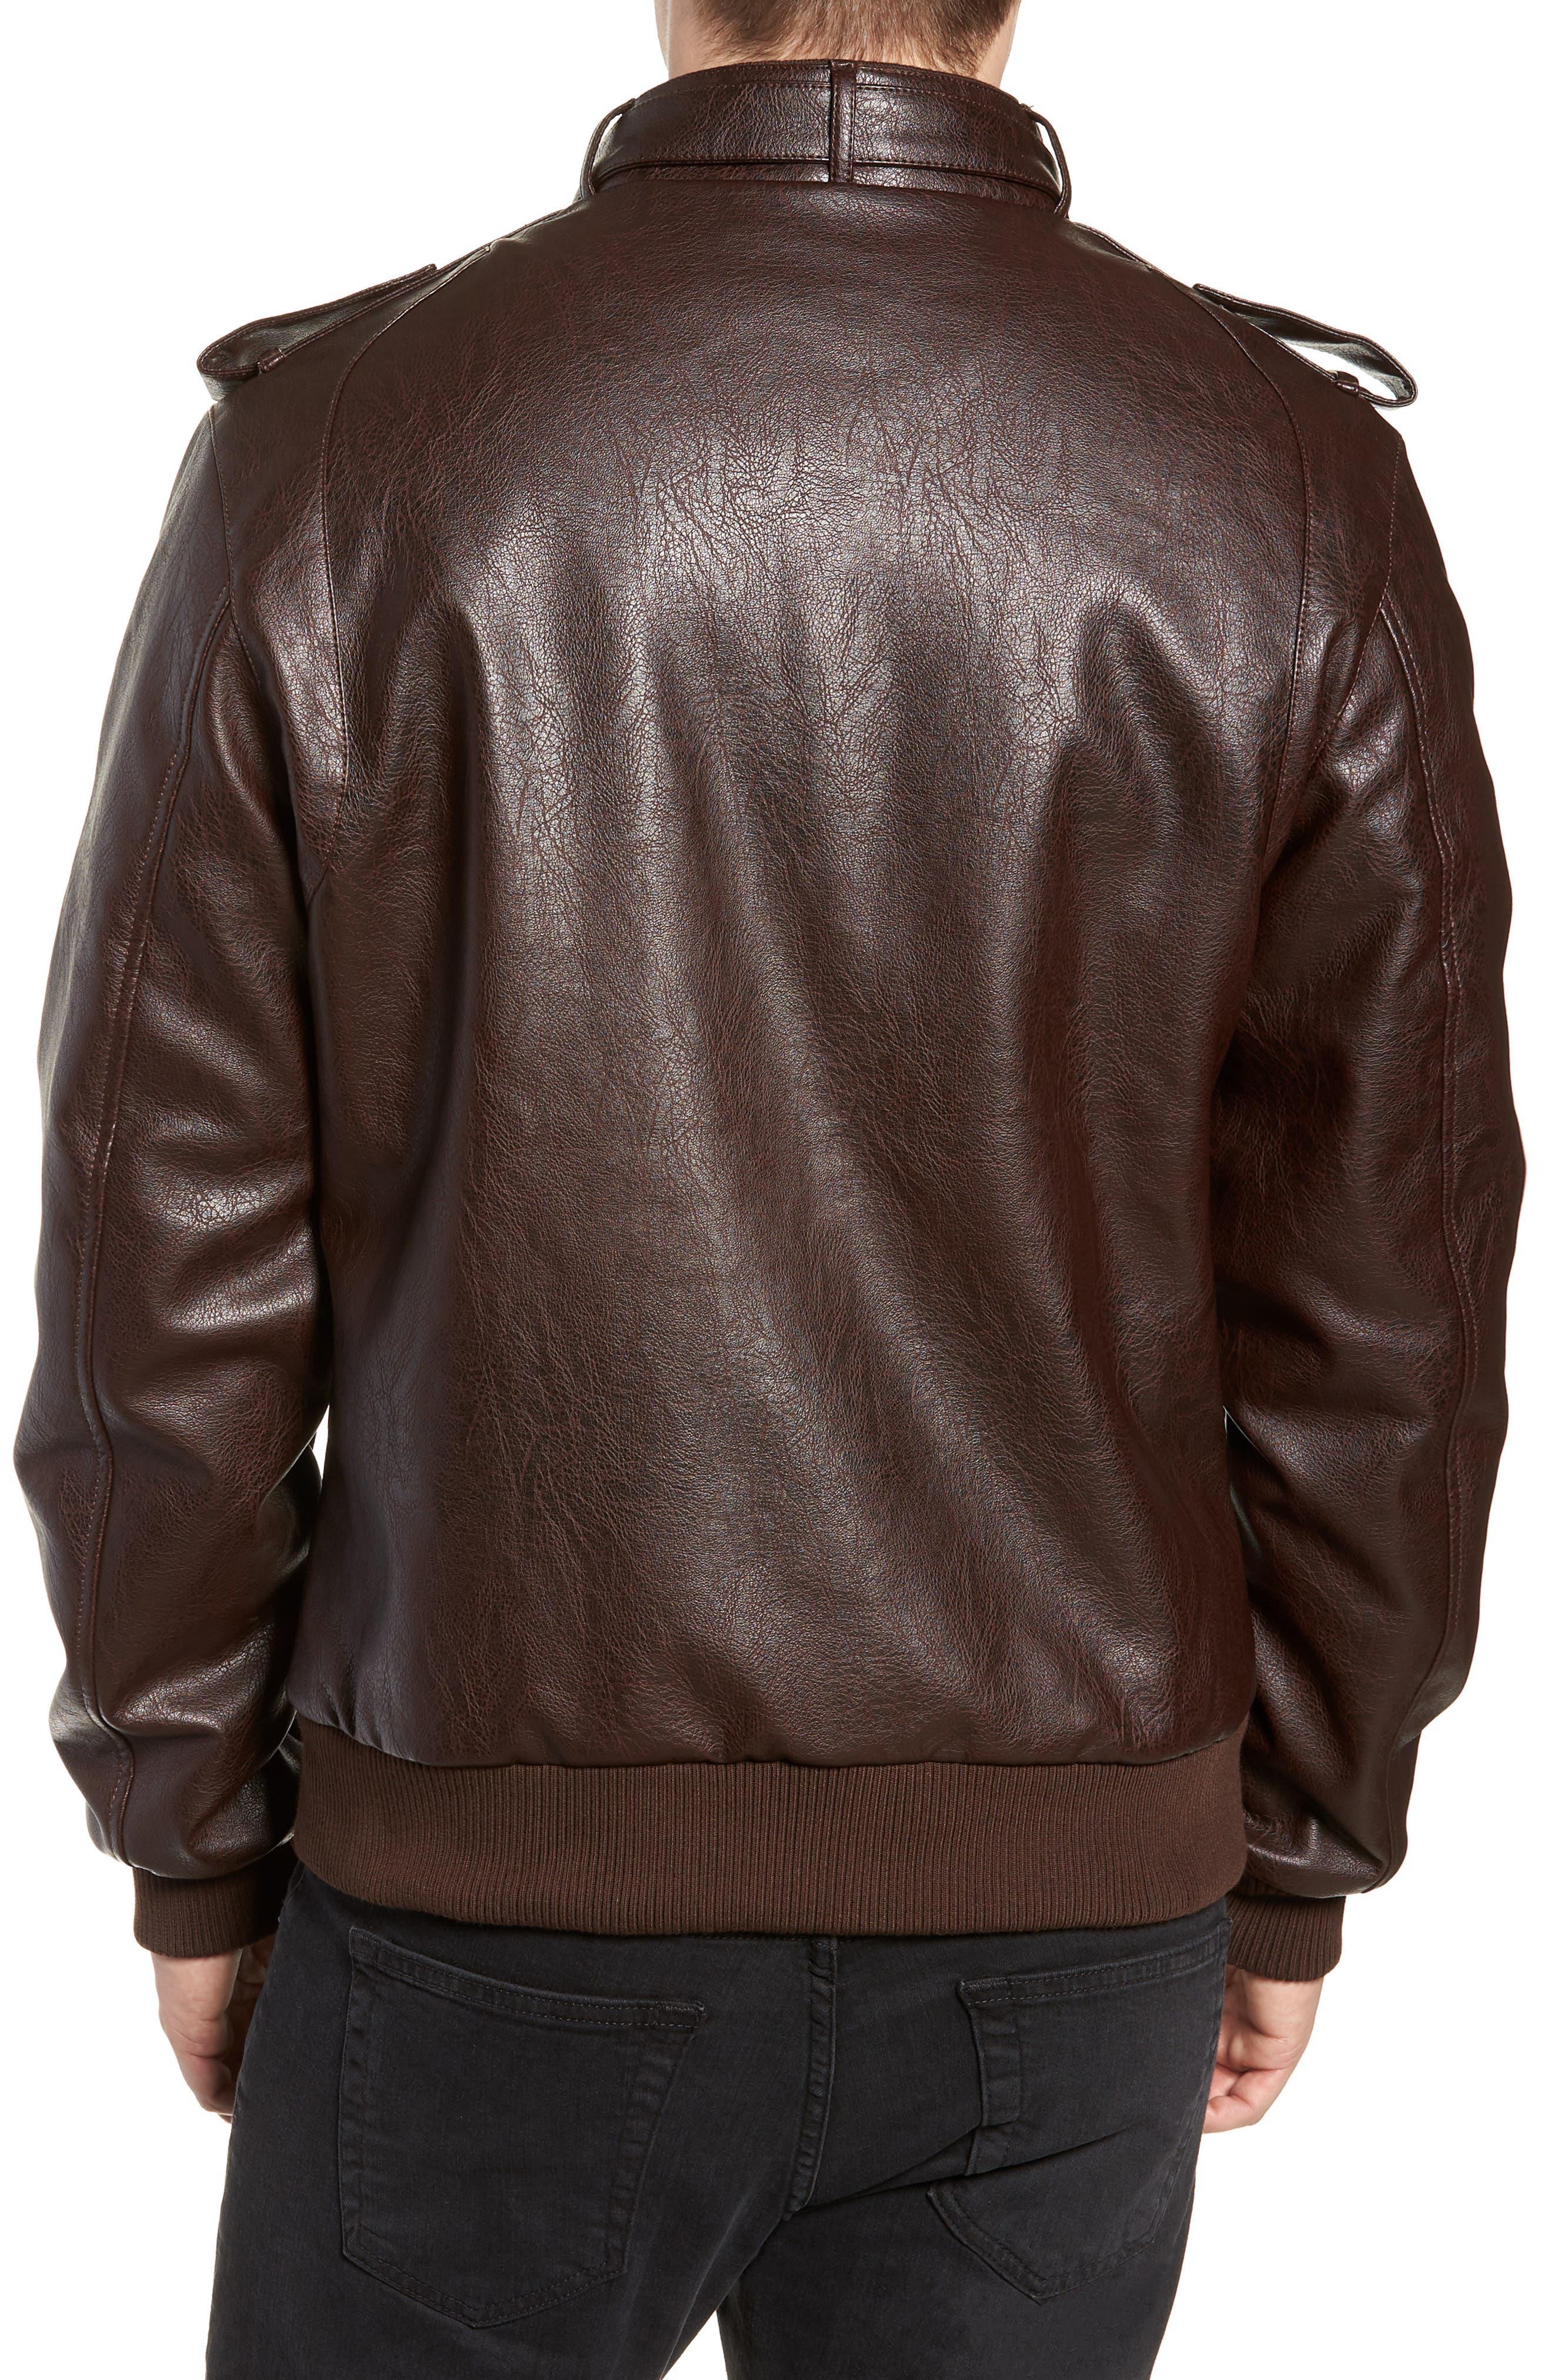 Vintage Faux Leather Racer Jacket,                             Alternate thumbnail 2, color,                             DISTRESSED BROWN